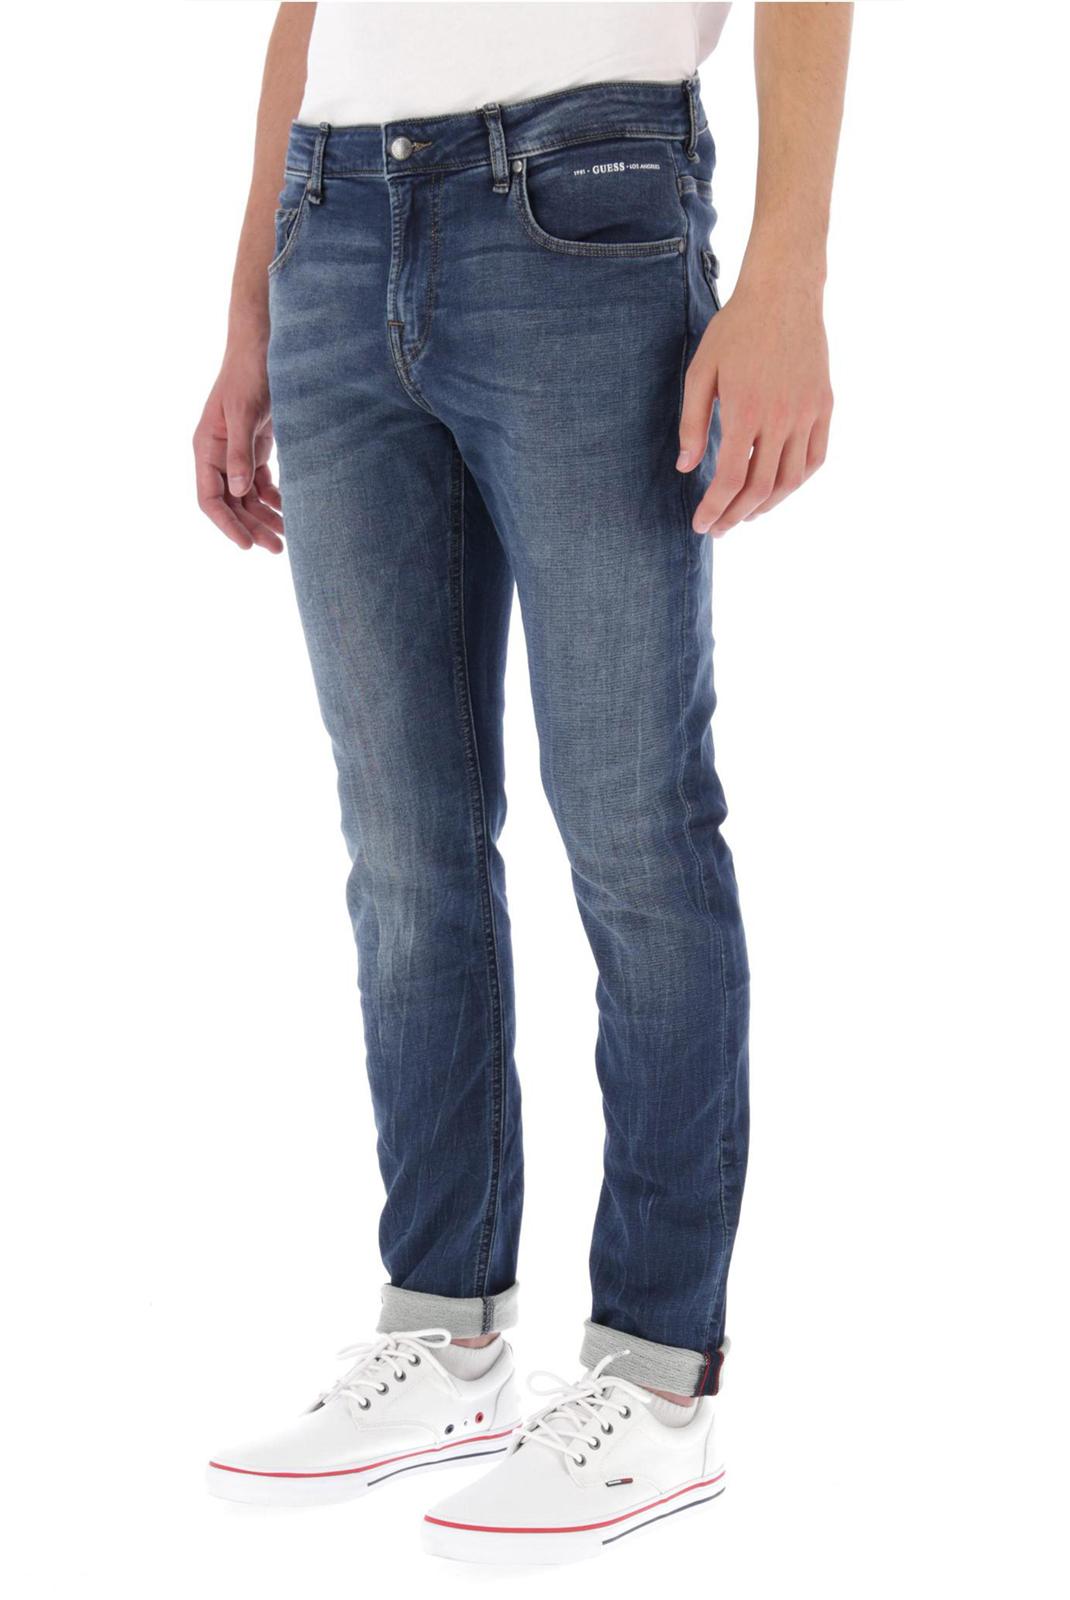 slim / skinny  Guess jeans M84A27 D3CE0 CHRIS SNIPER